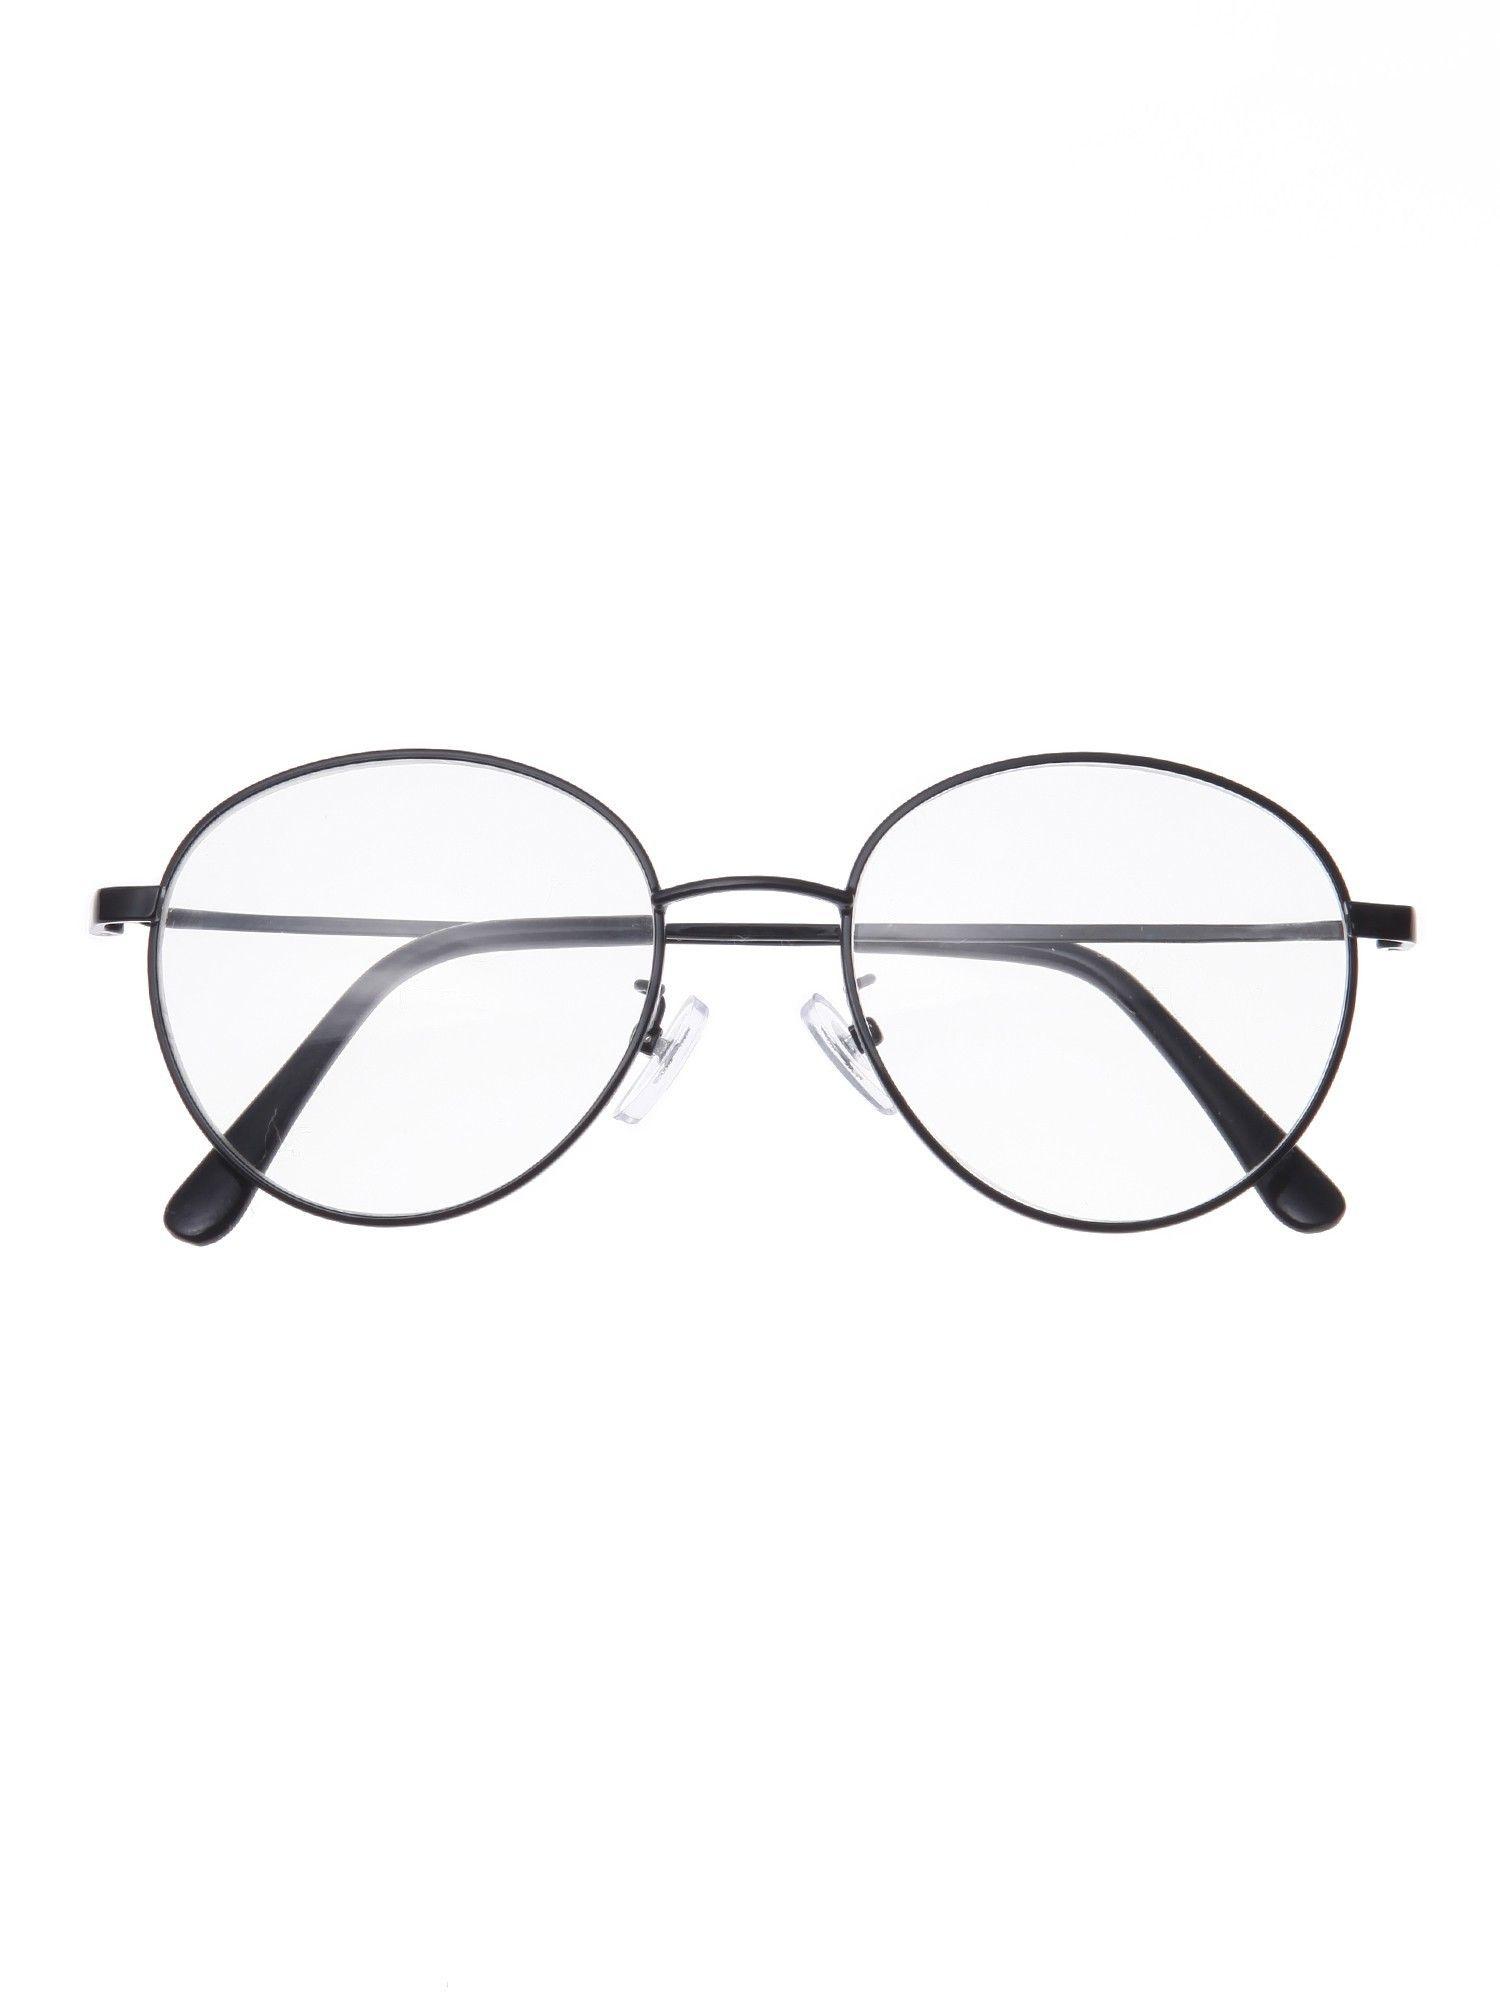 SLIM LIM伊達眼鏡